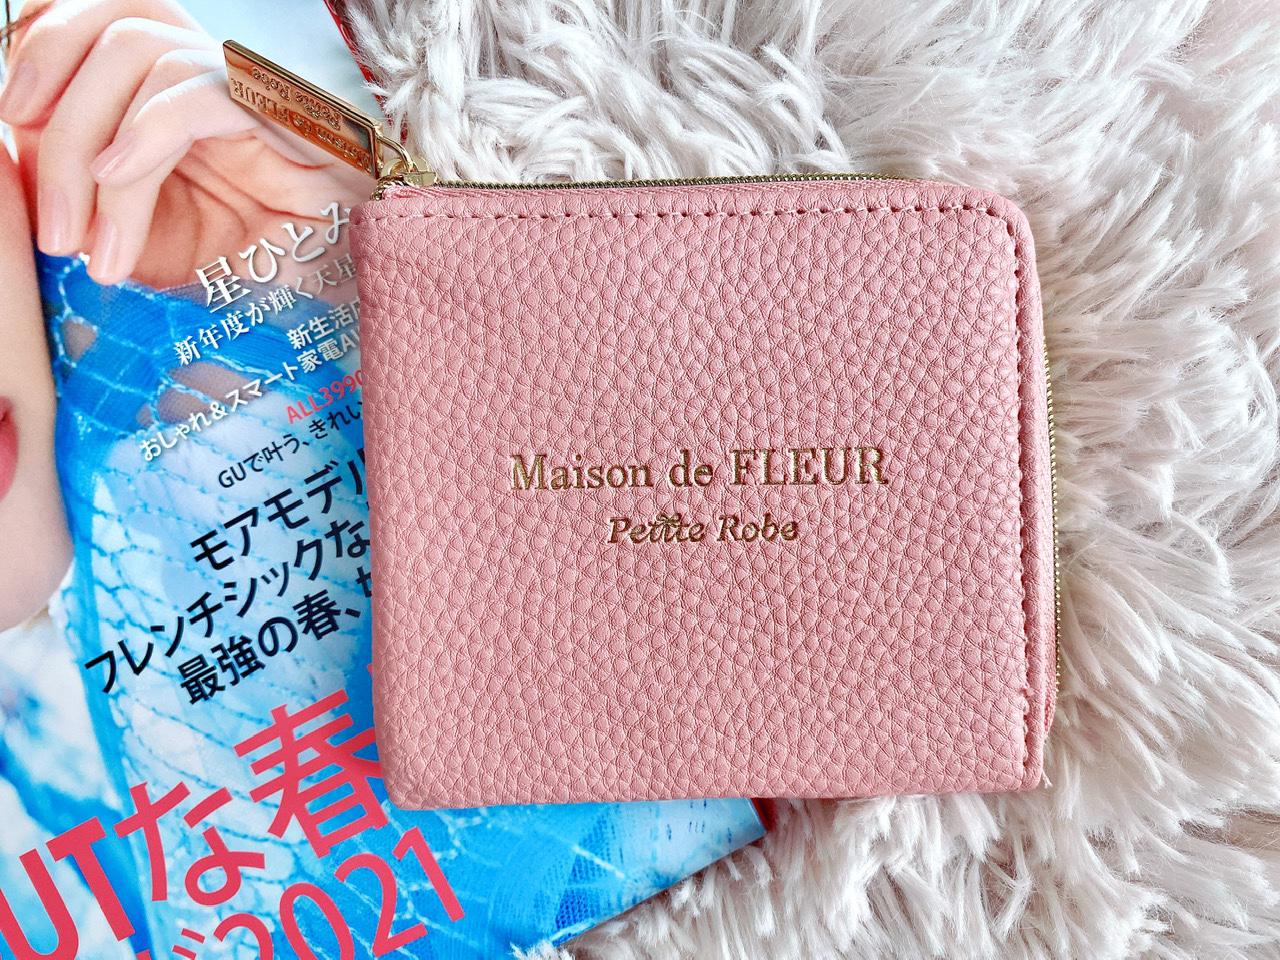 【MORE5月号】今月買うべき神付録!《メゾンドフルール》レザー調ミニ財布が可愛すぎ♡_4